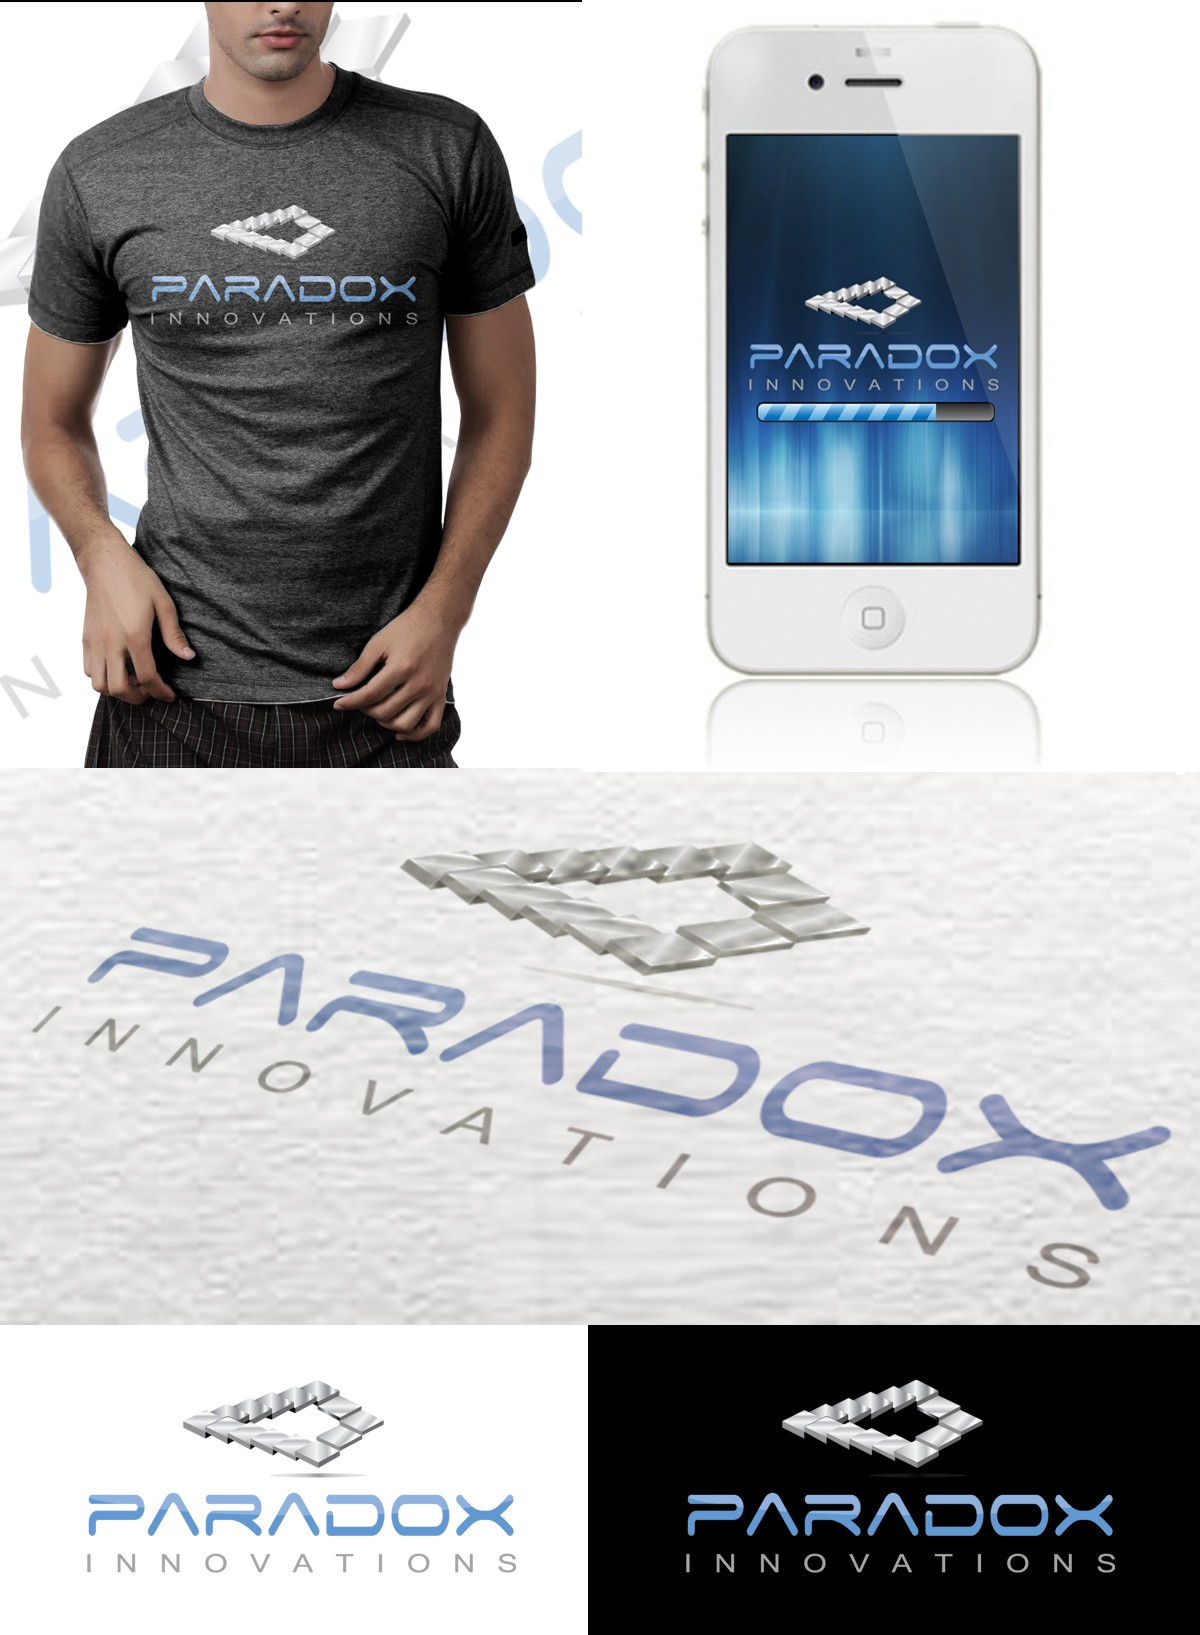 Paradox Innovations needs a new logo